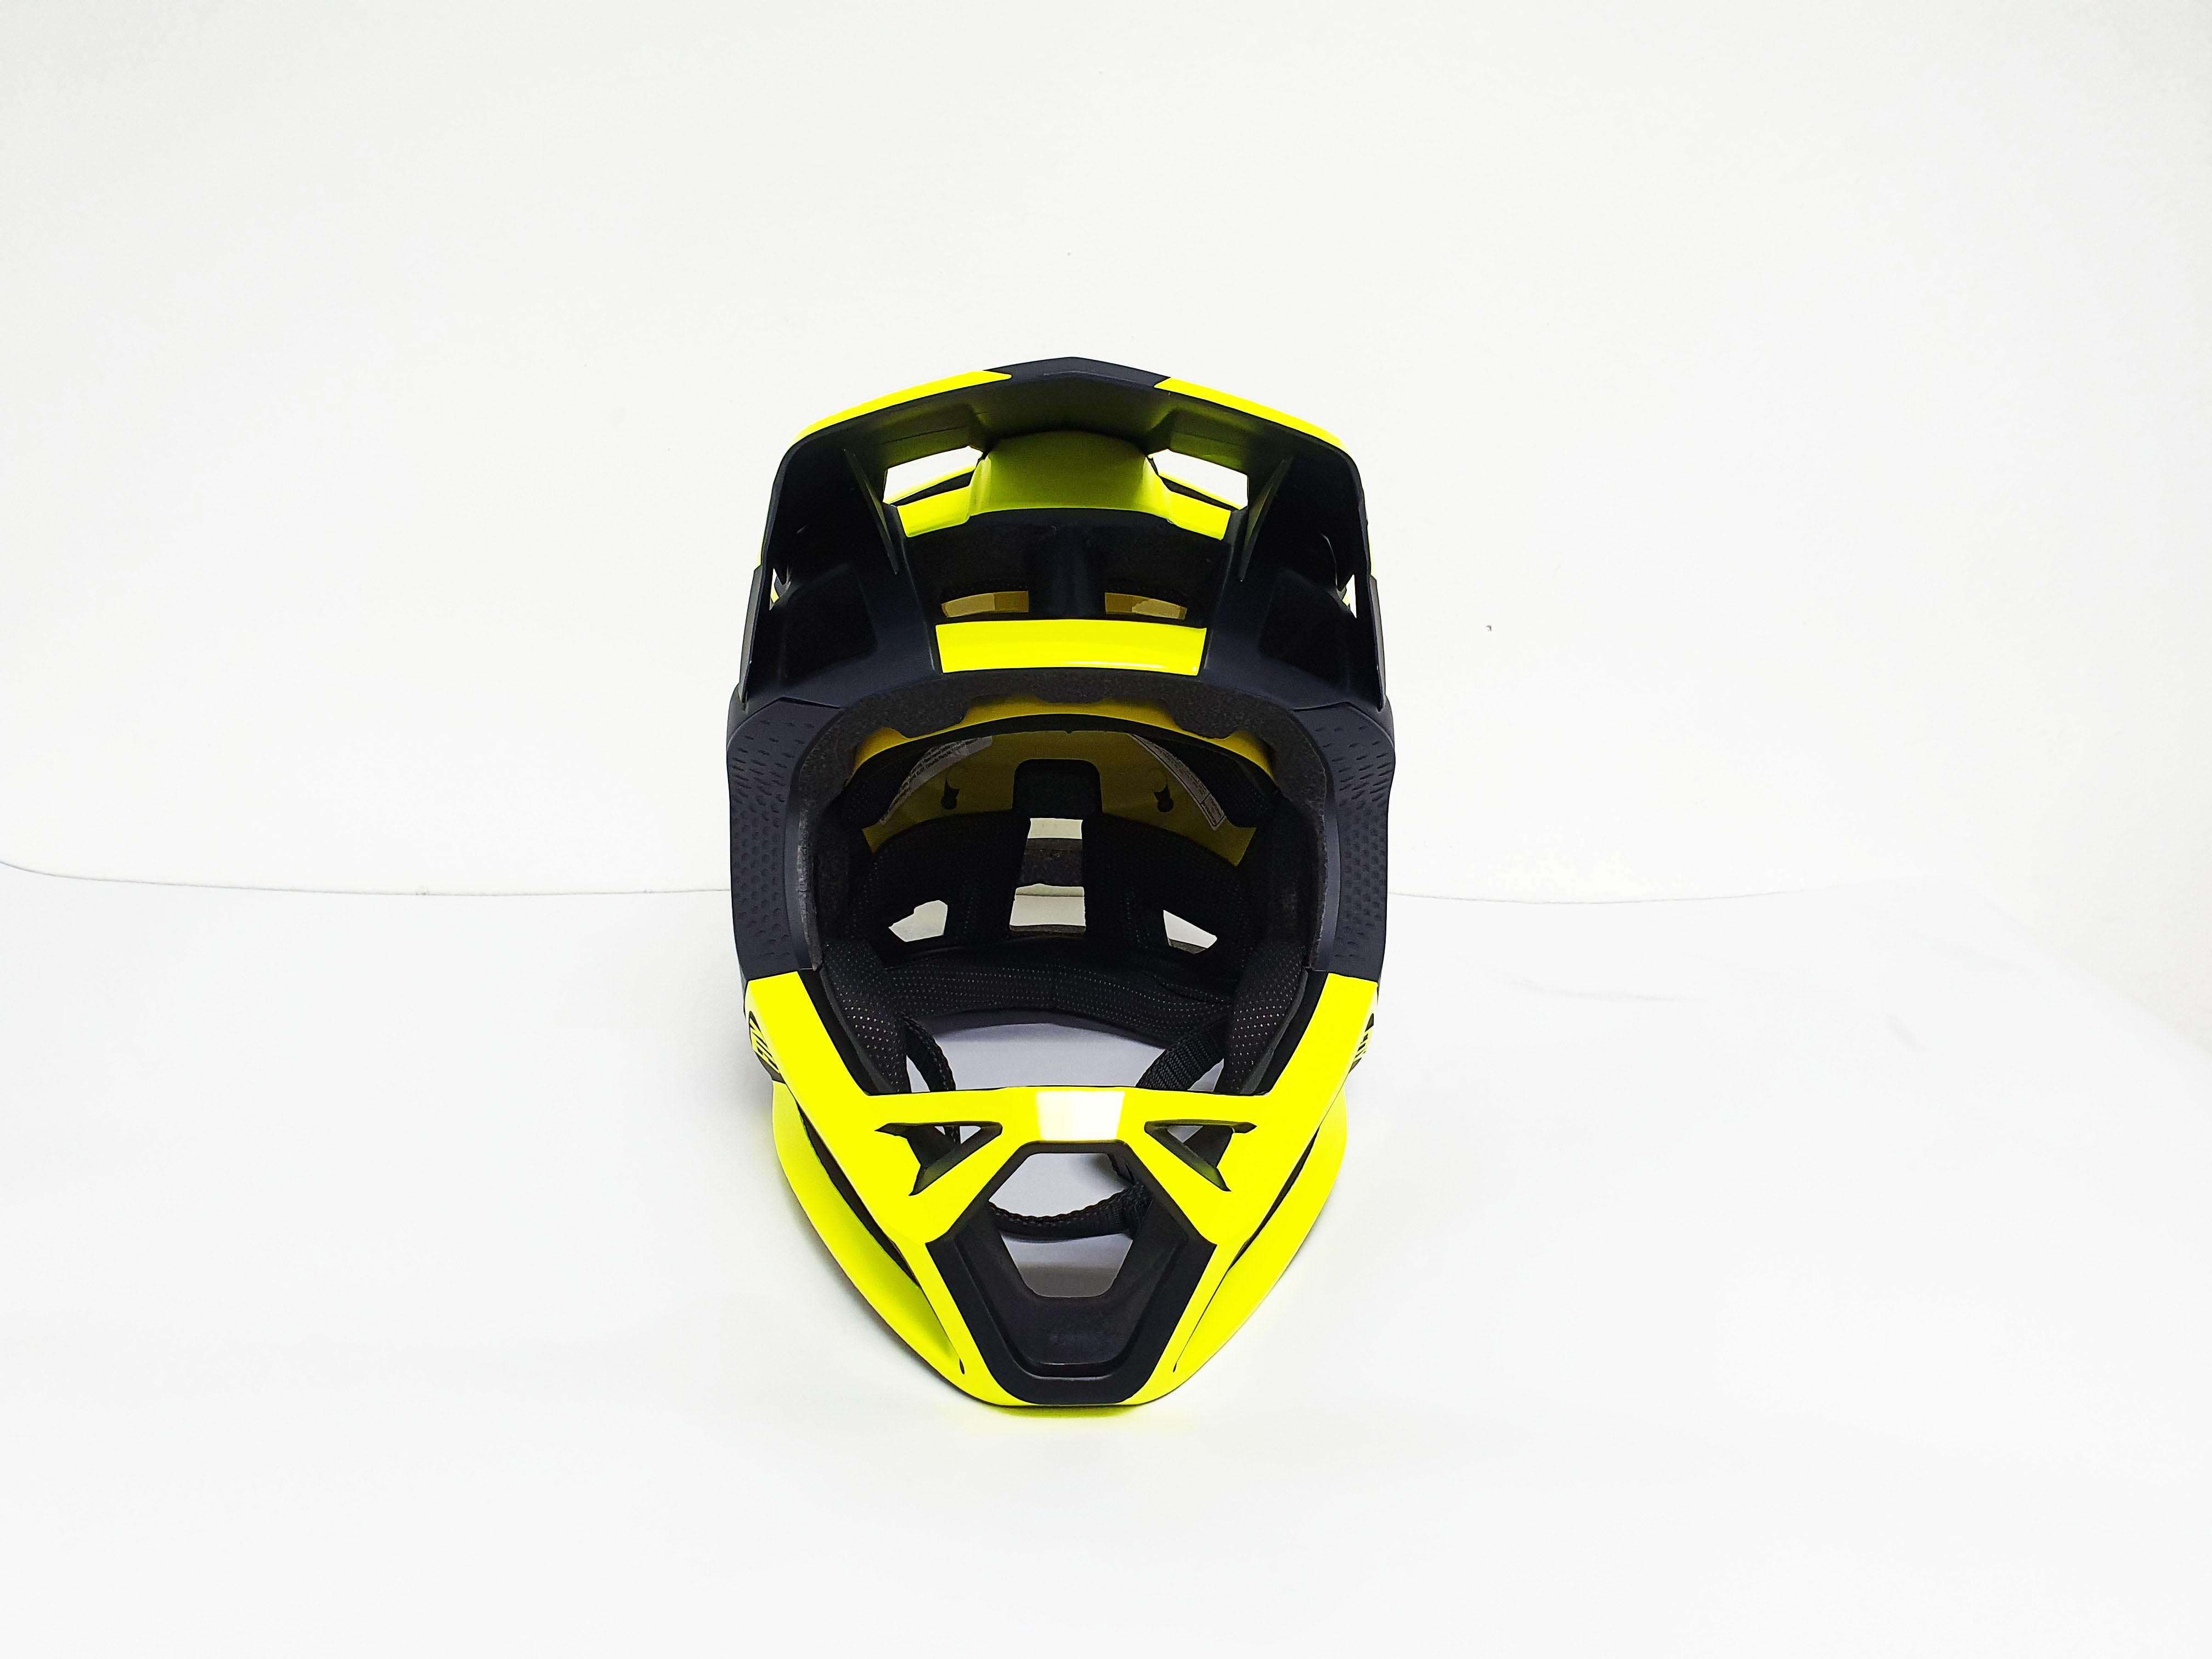 Suzuki B-King for Fox Helmet in Bright Yellow and Black